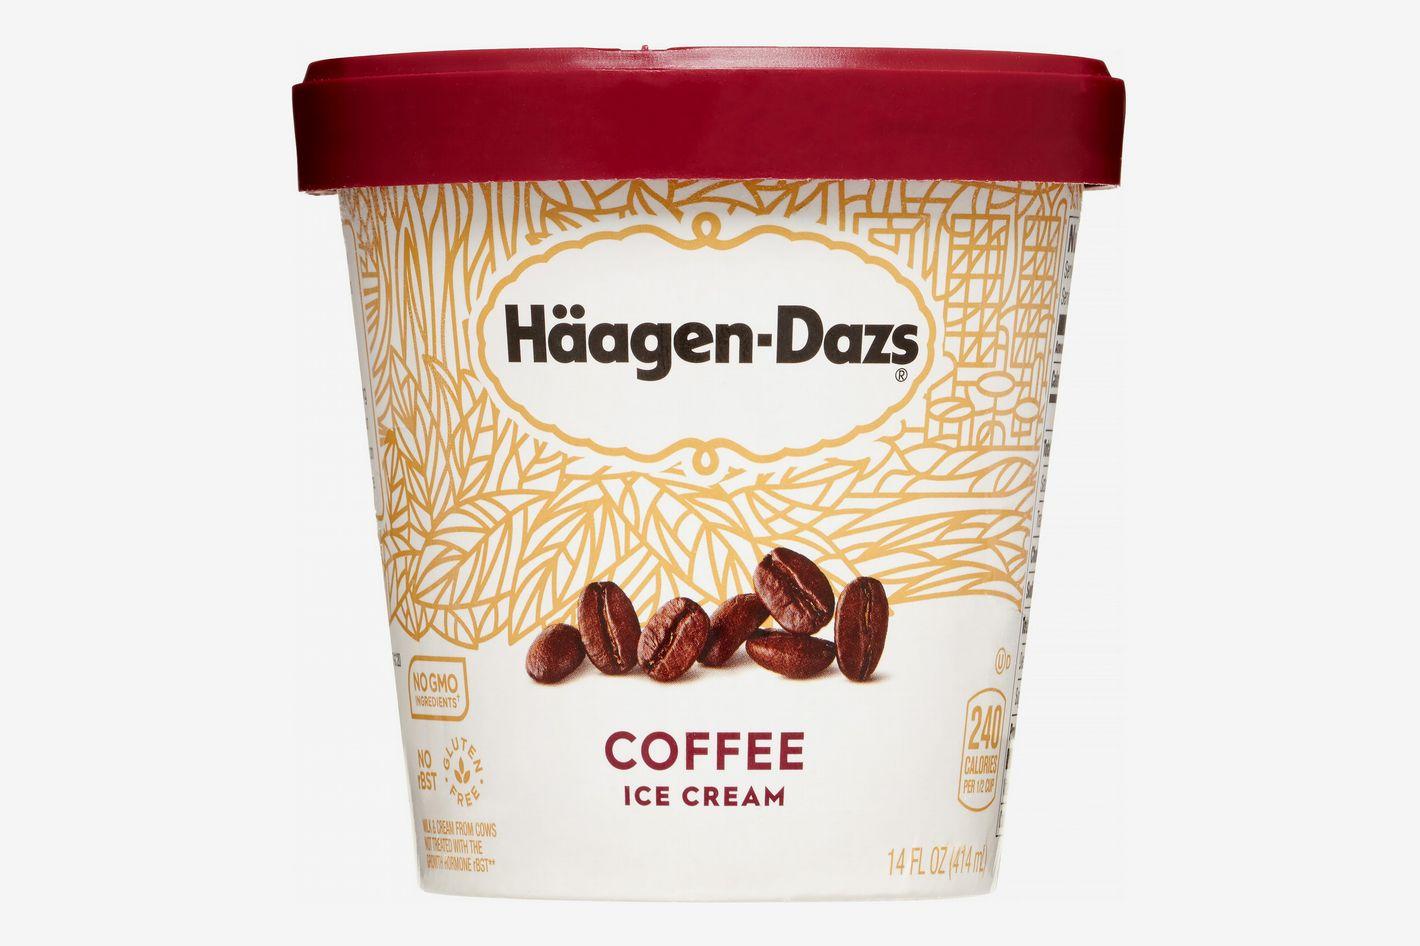 Häagen-Dazs Coffee Ice Cream